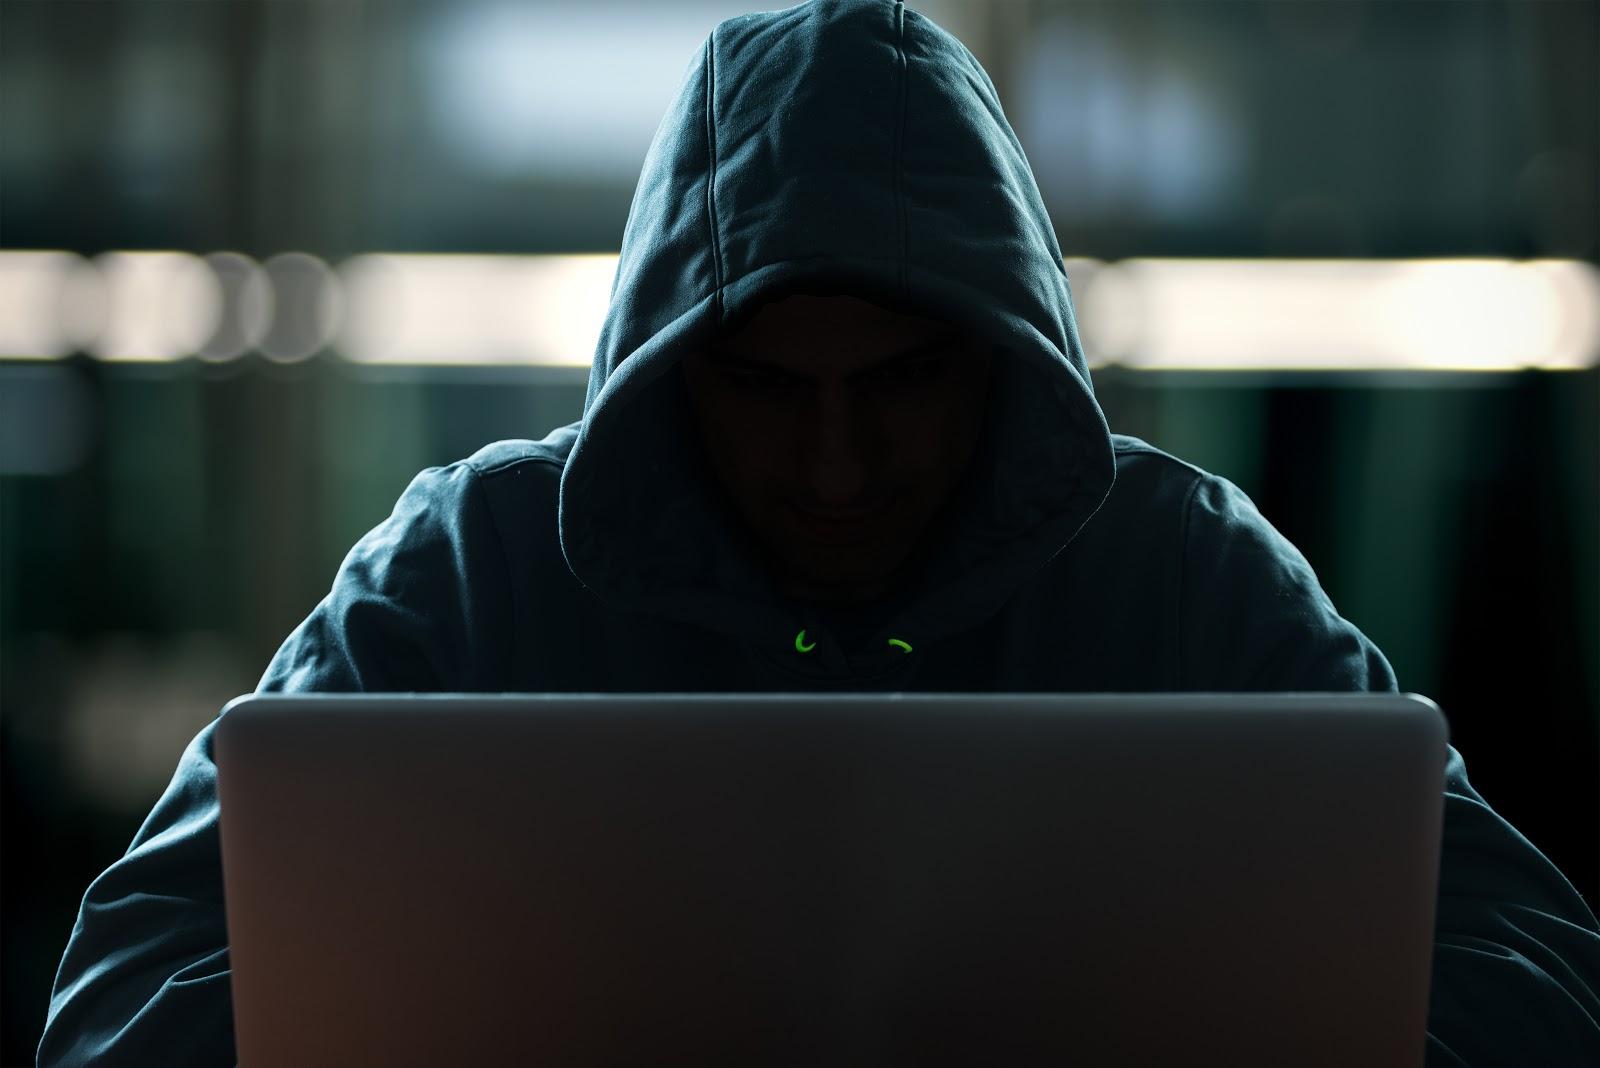 Hacker AdobeStock 107212183